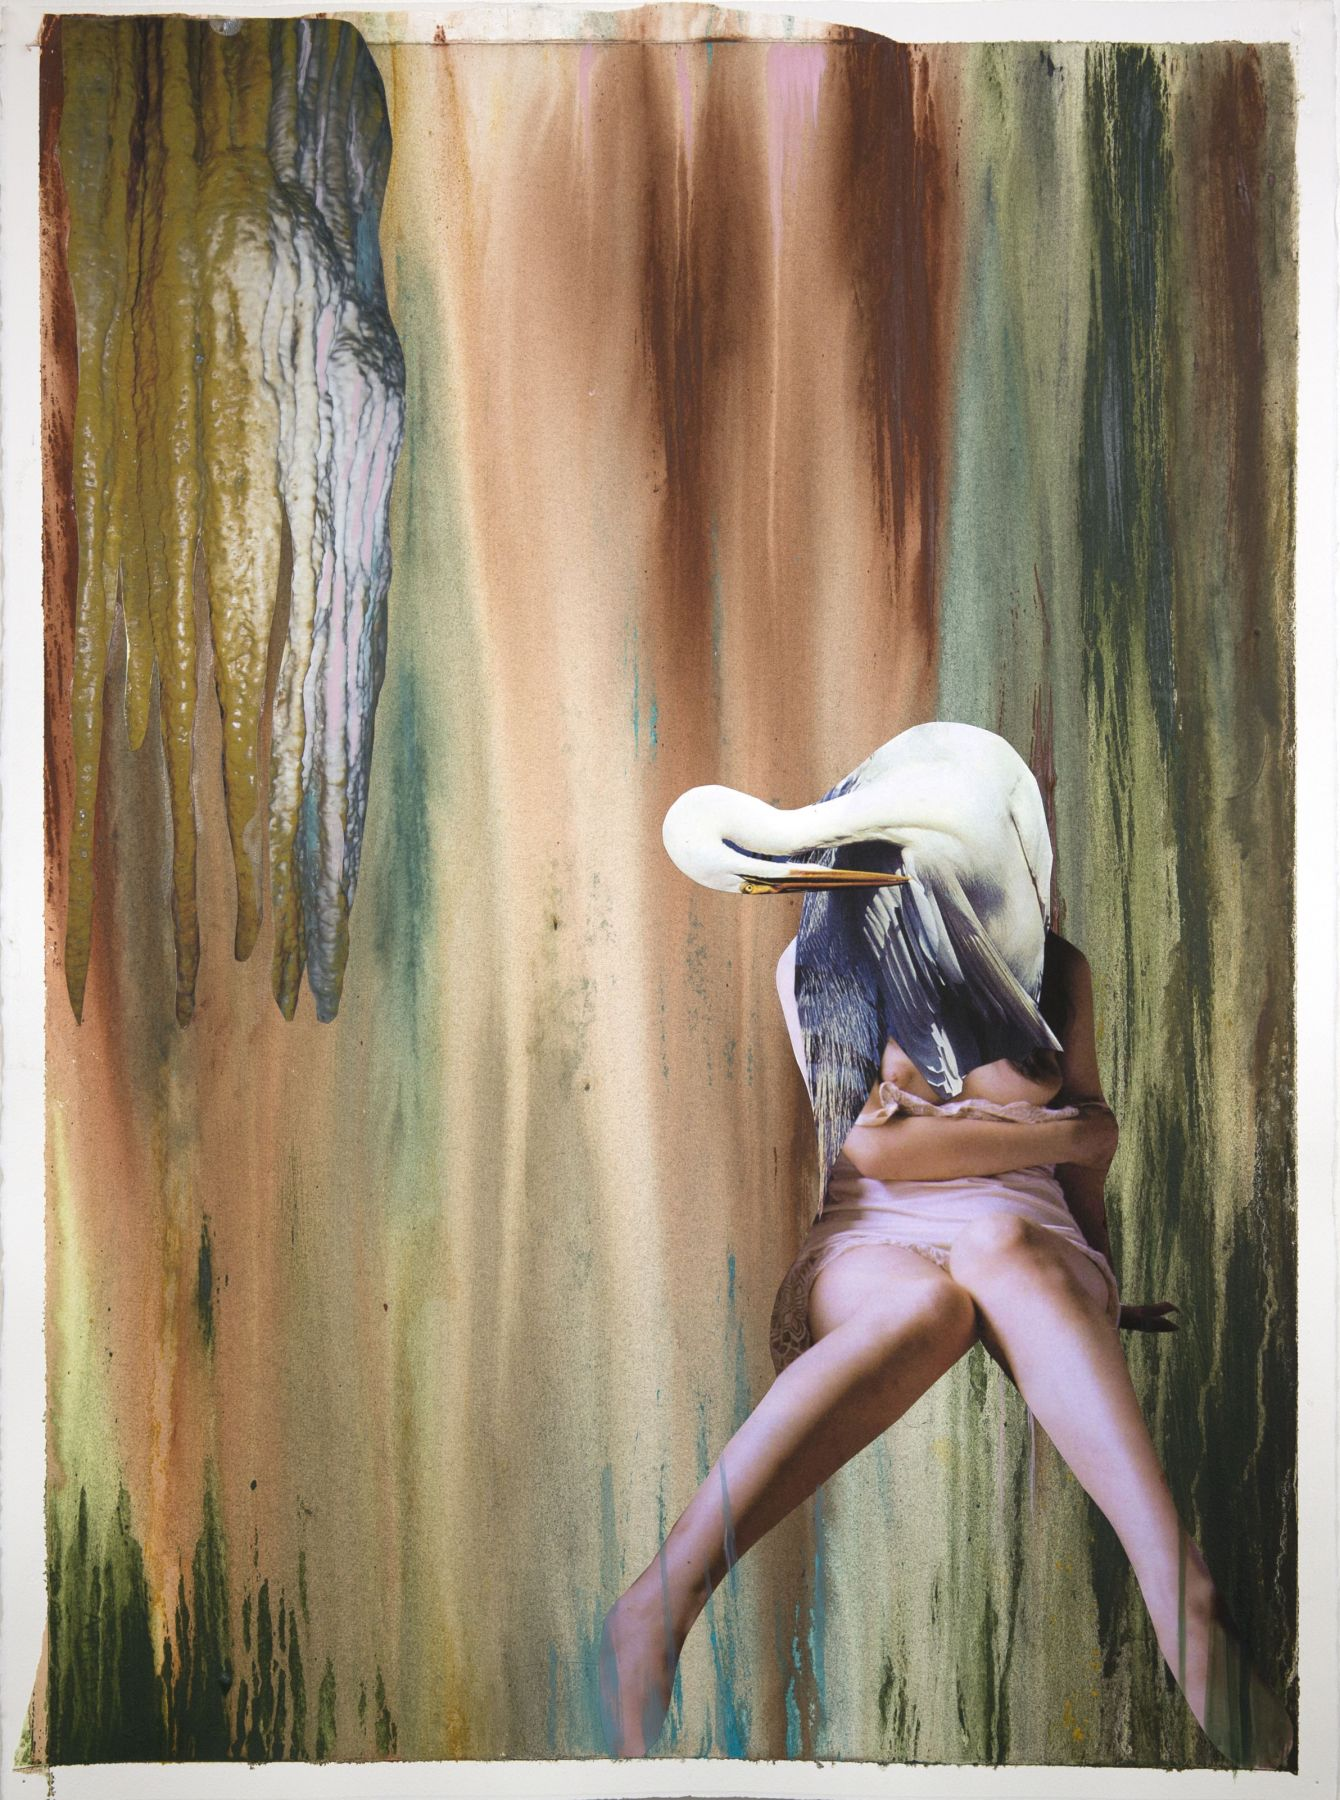 Becoming the White Heron, 2015